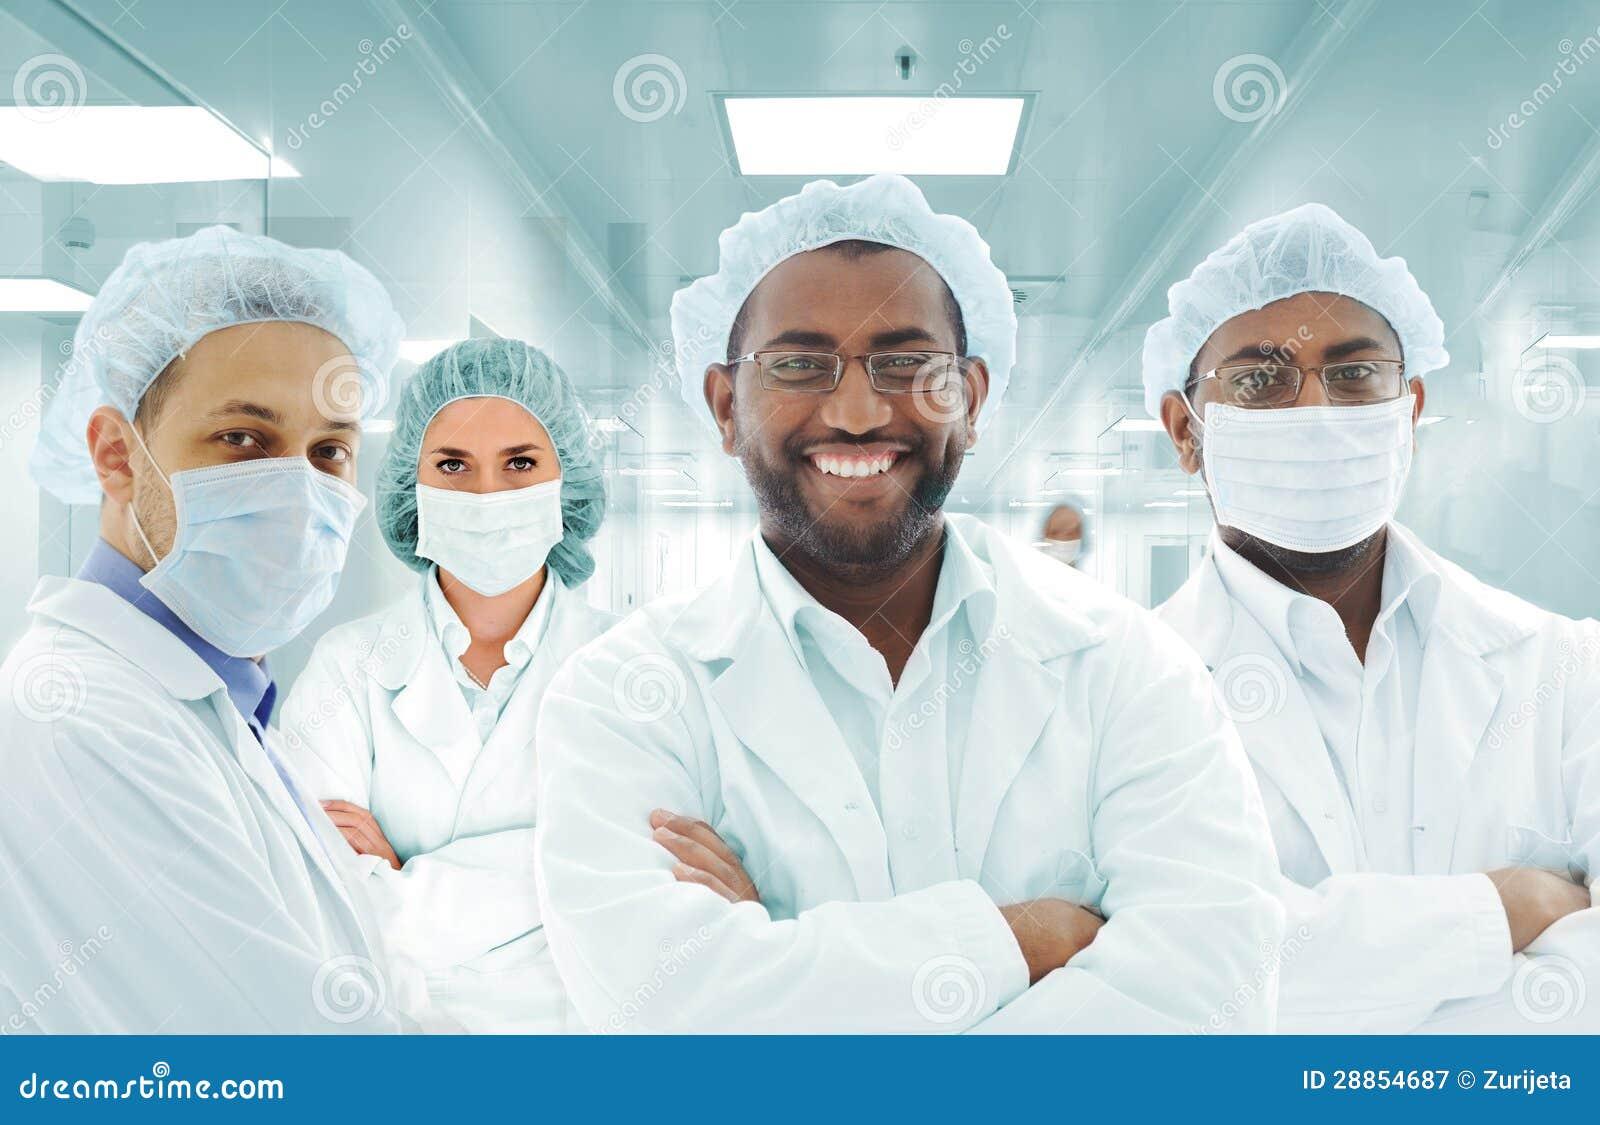 Forskarearabiskalaget på sjukhuslabbet, grupp av manipulerar